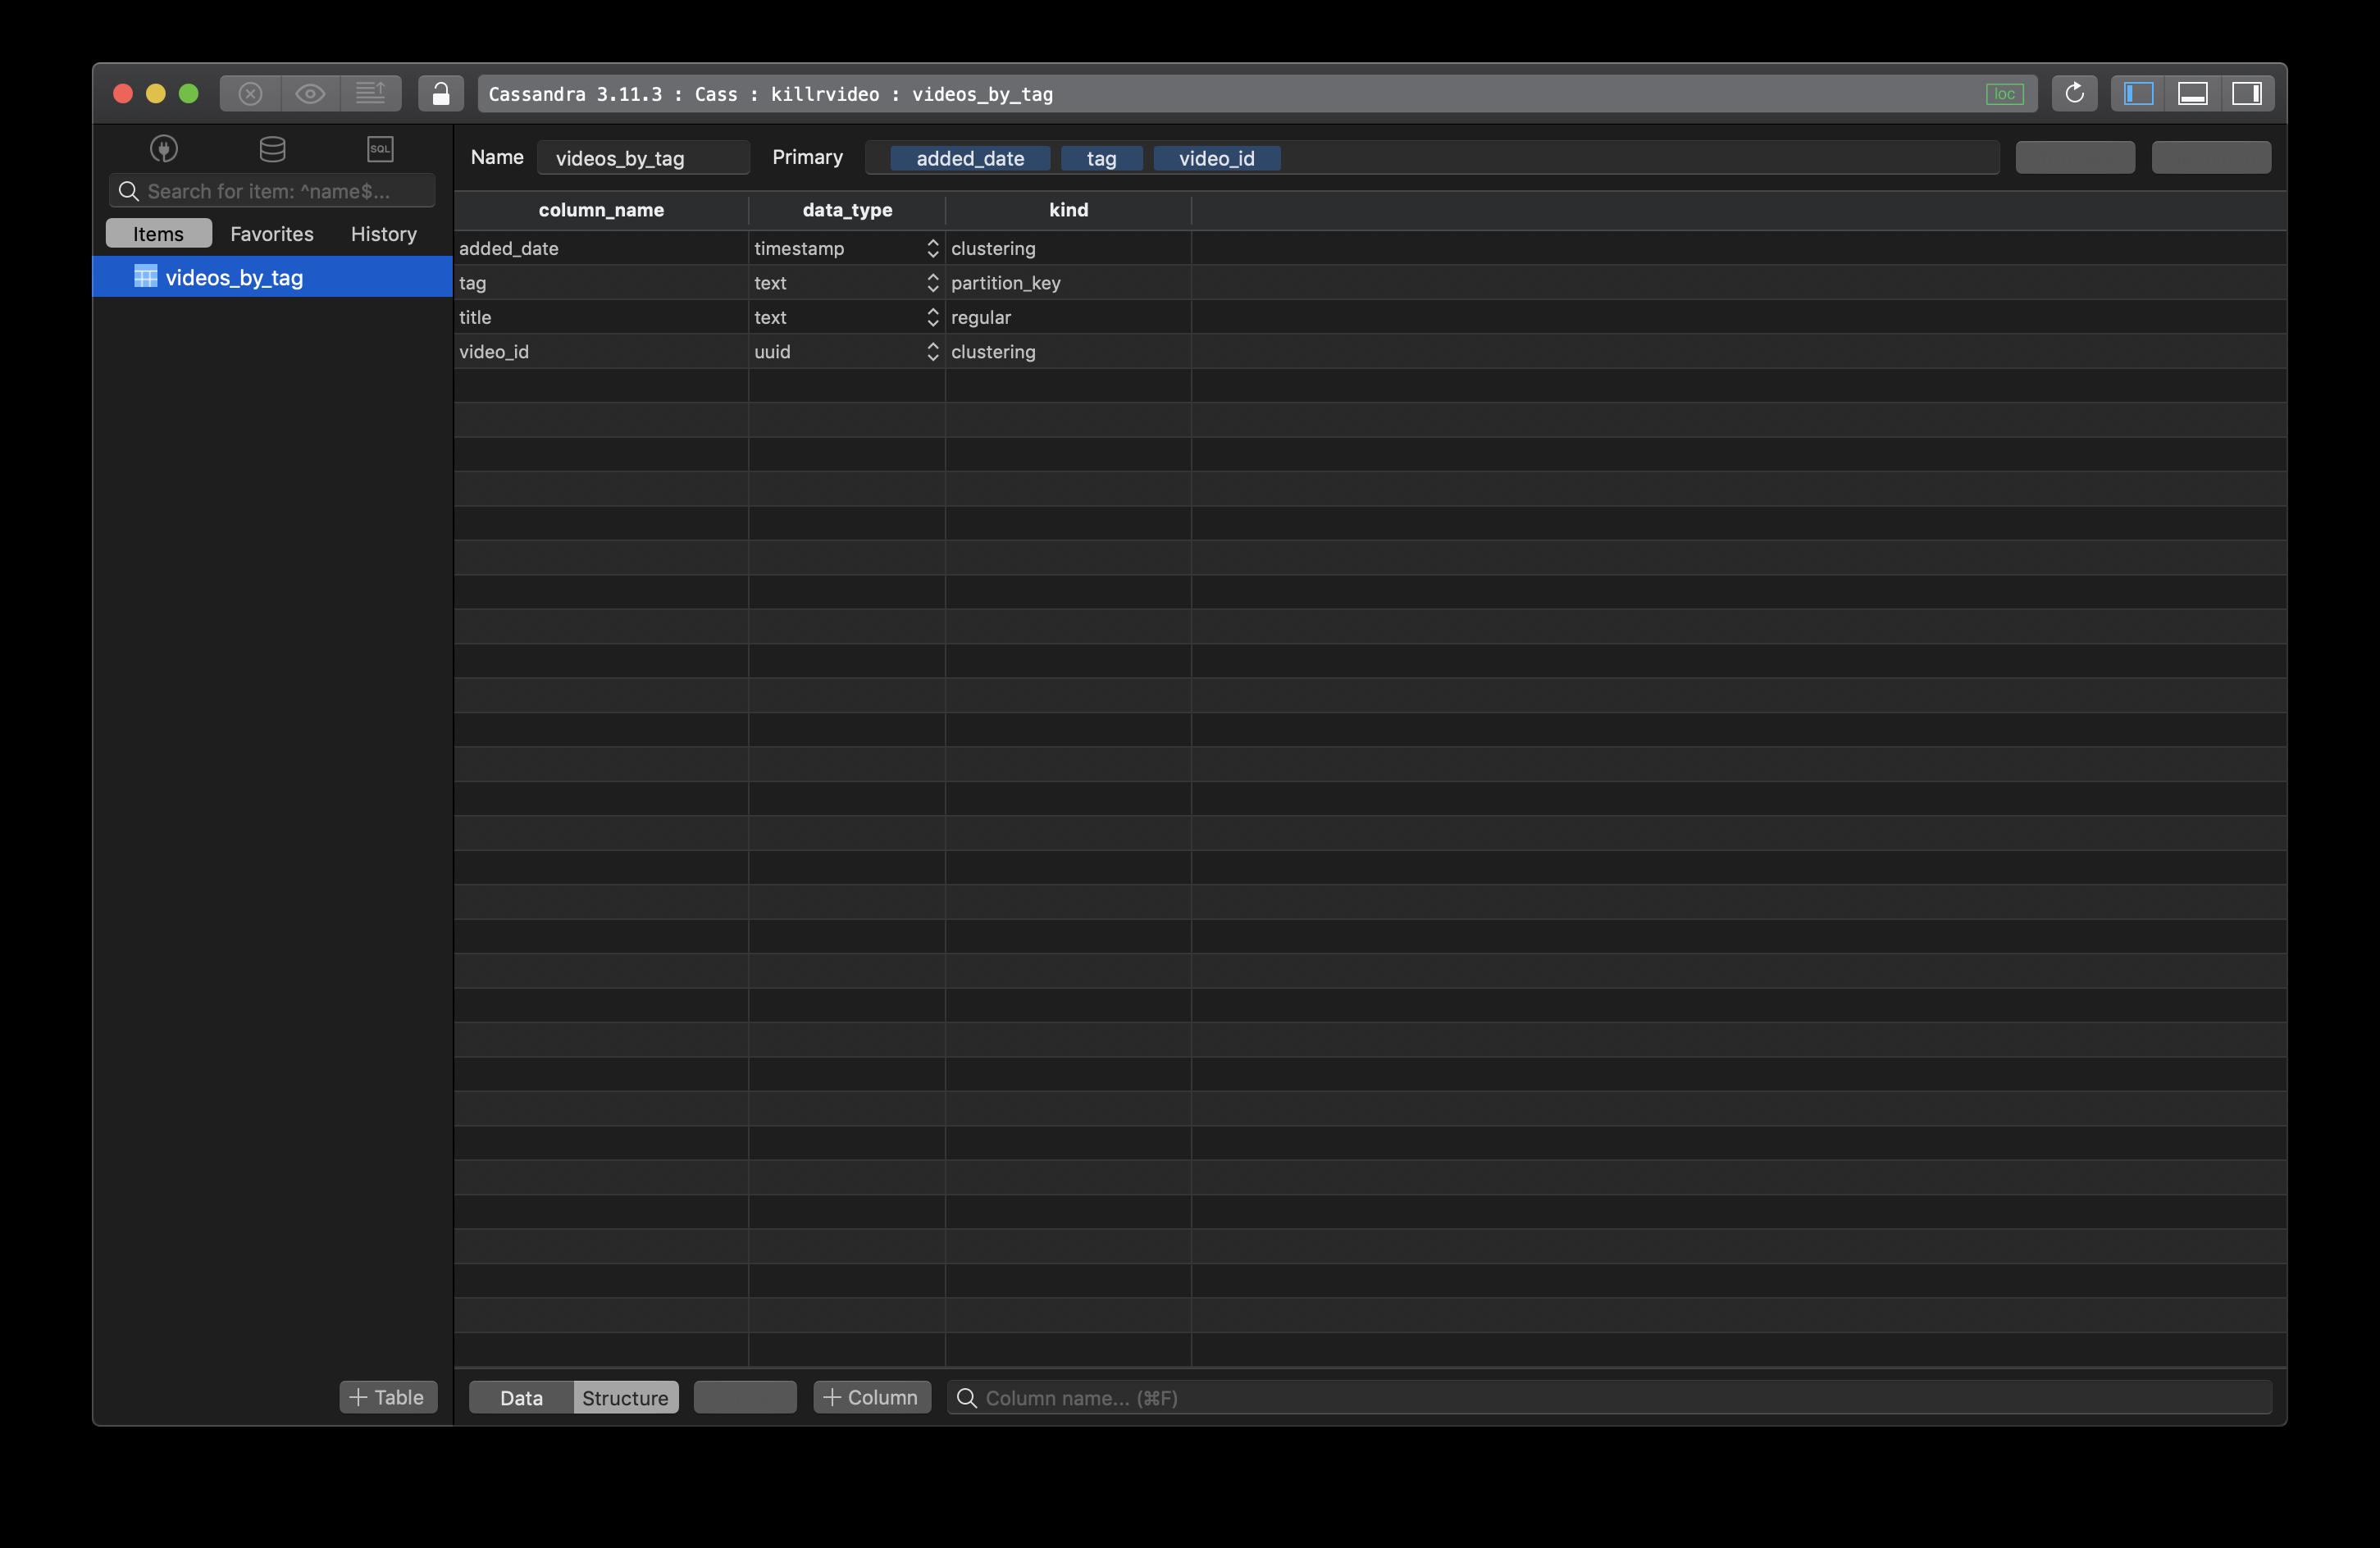 cassandra delete by partition key